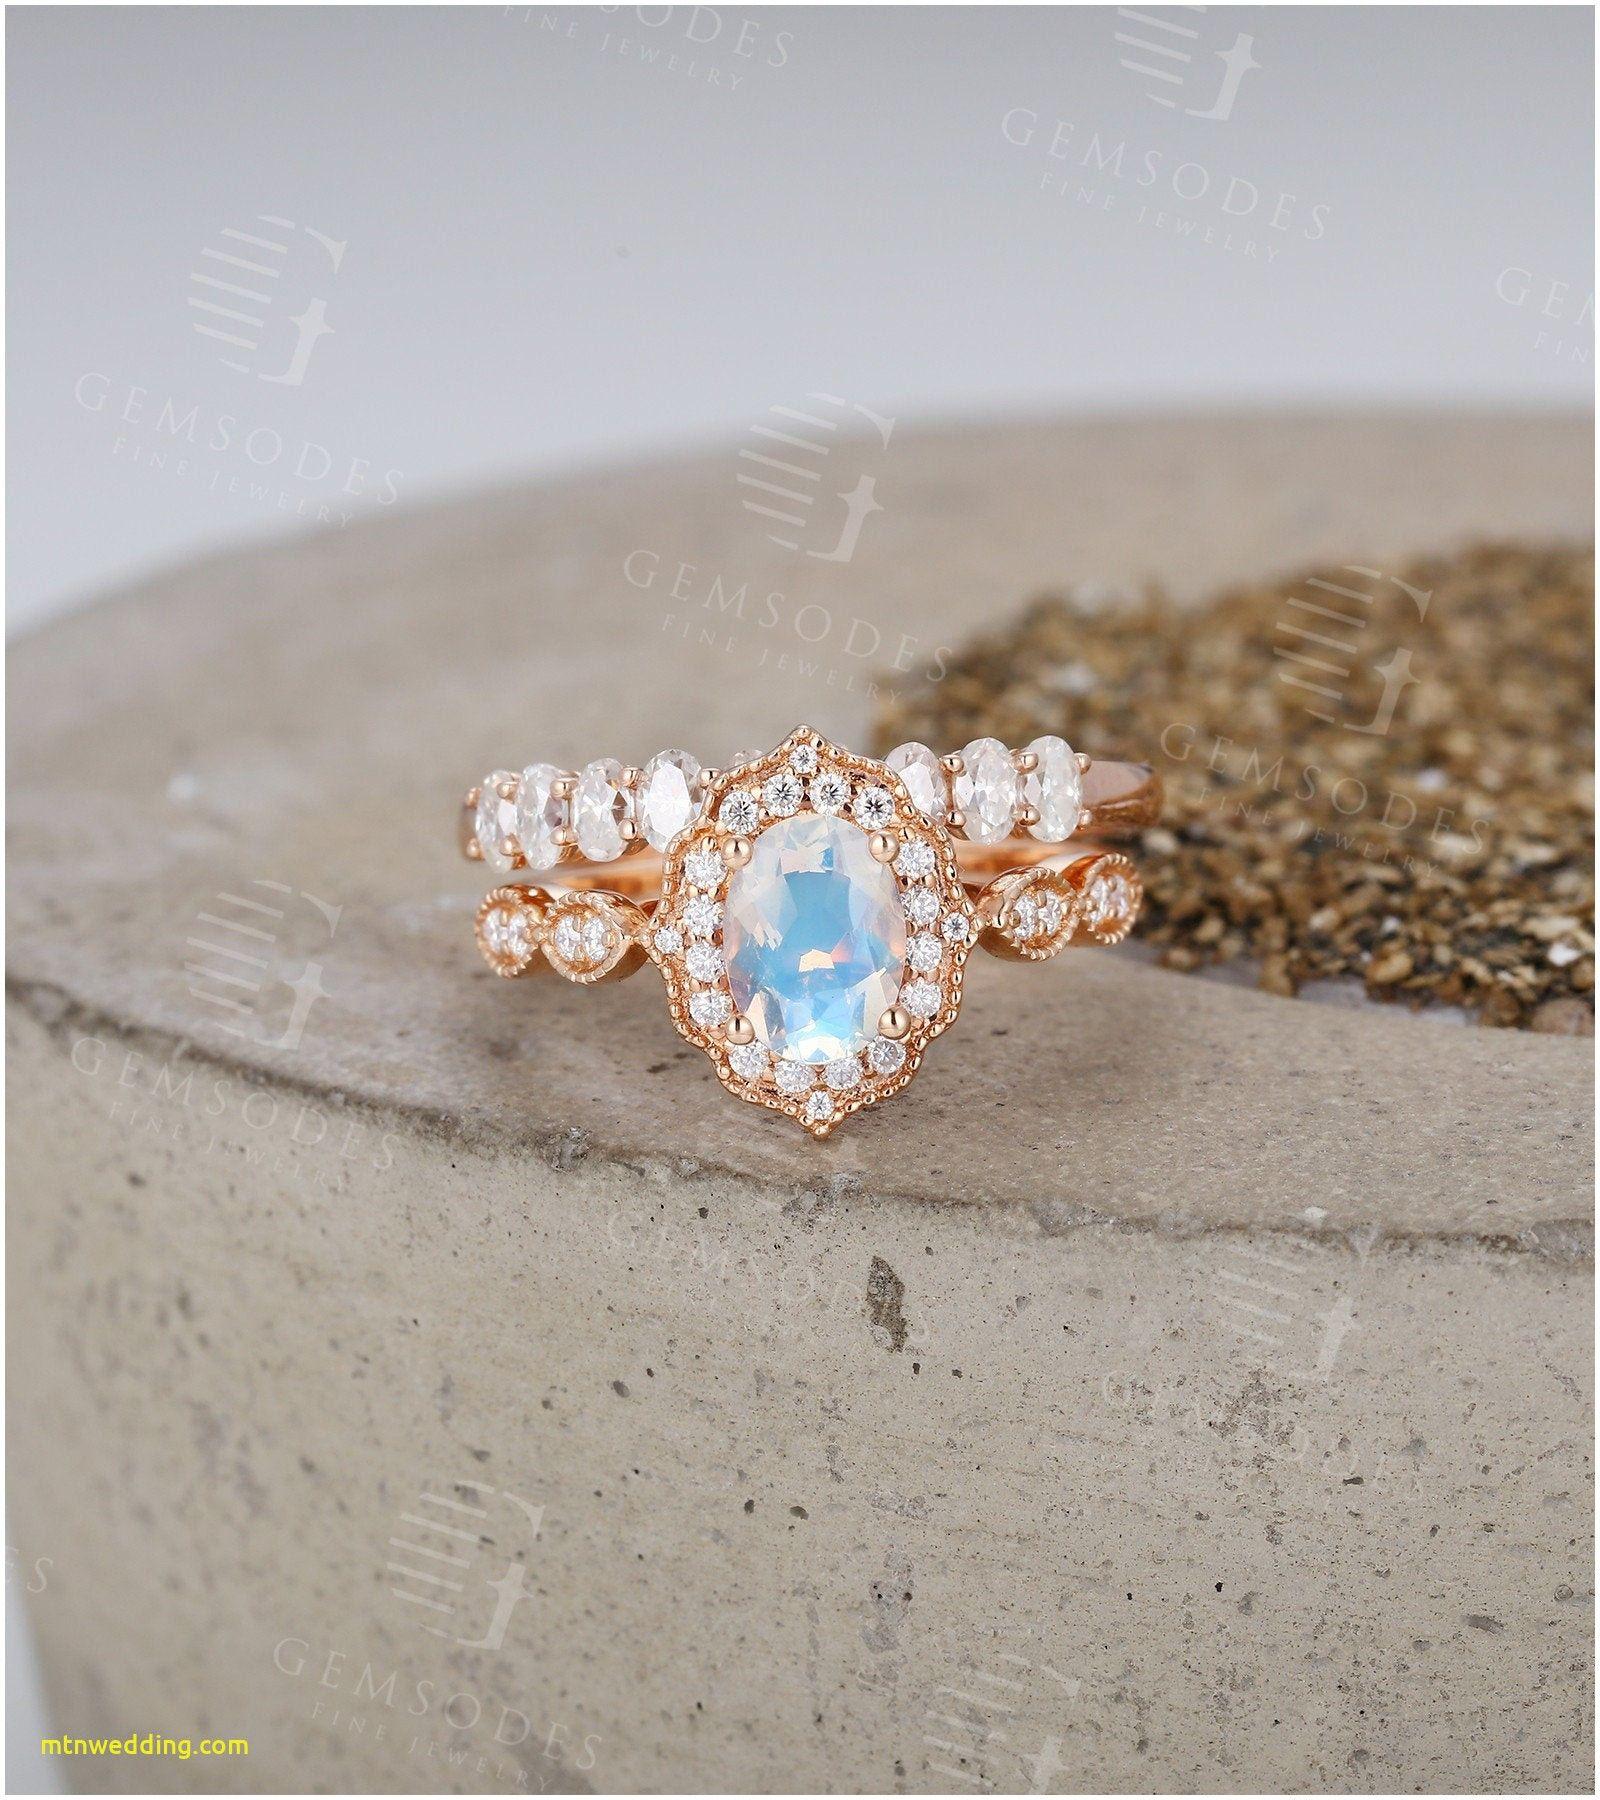 Unique Diamond Wedding Anniversary Decoration Ideas Check More At Http Mtnwedding Com Wedding Decoration Diamond Wedding Anniversary Decoration Ideas